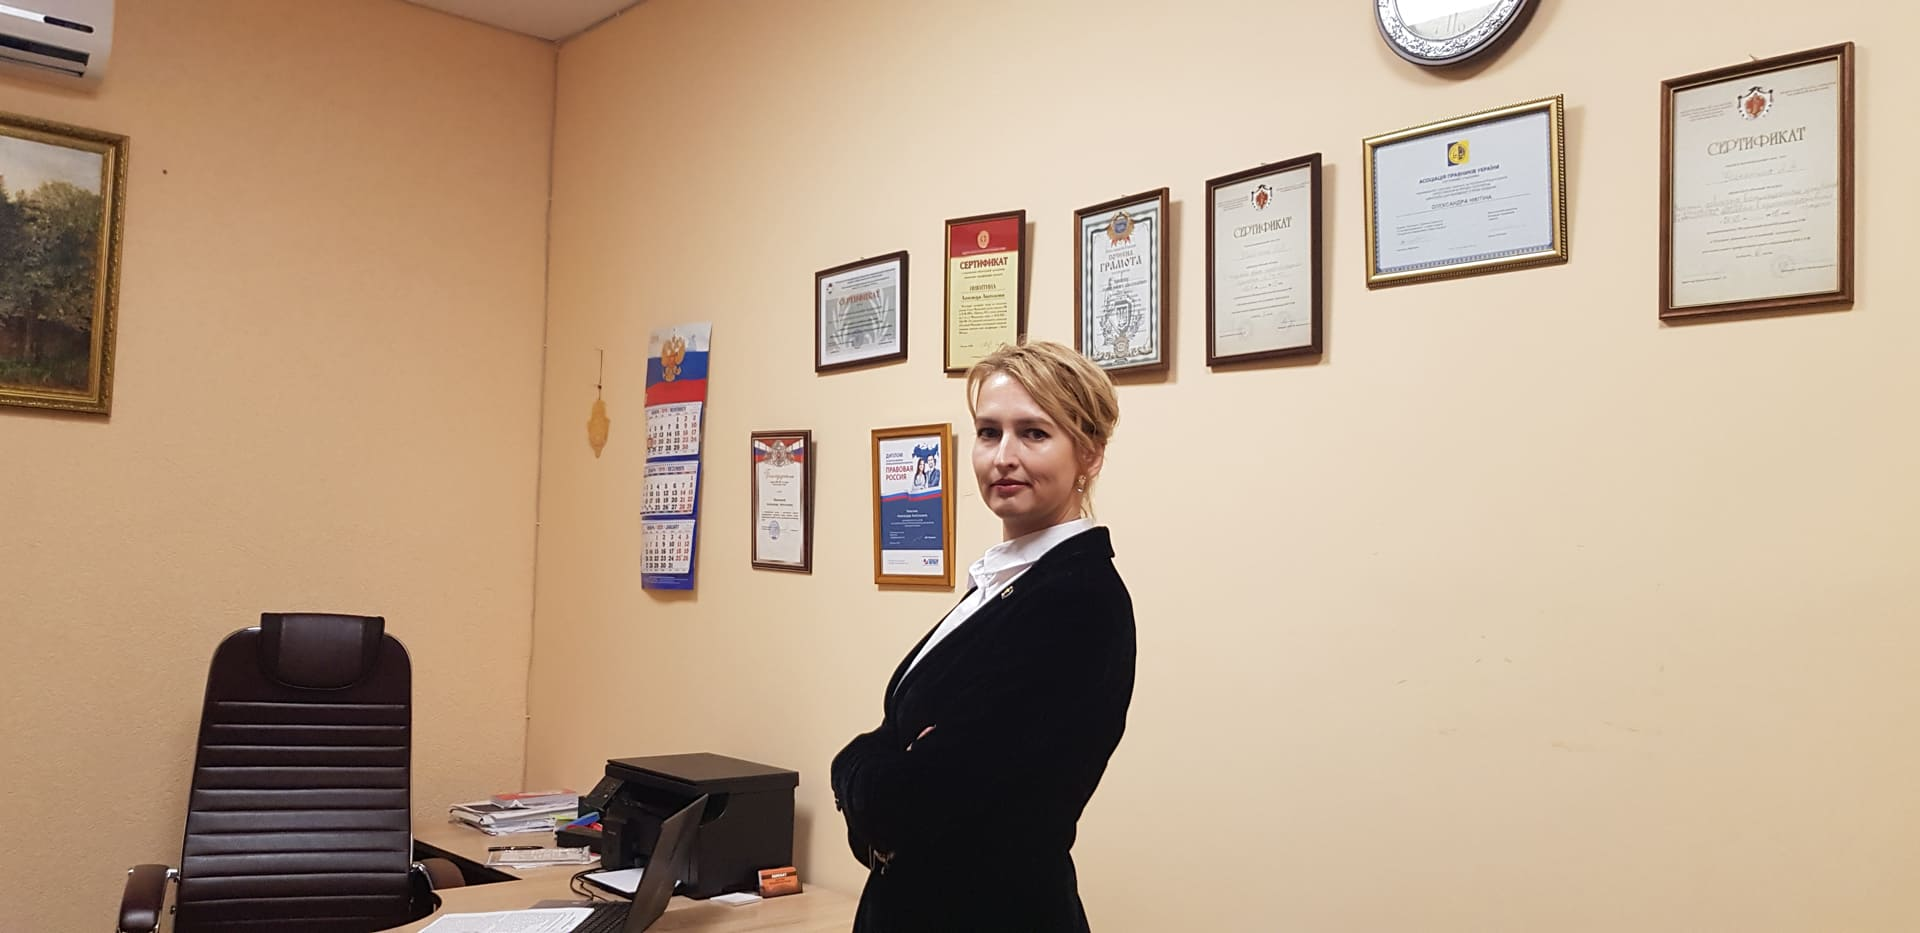 Адвокат Симферополя - Никитина Александра Анатольевна